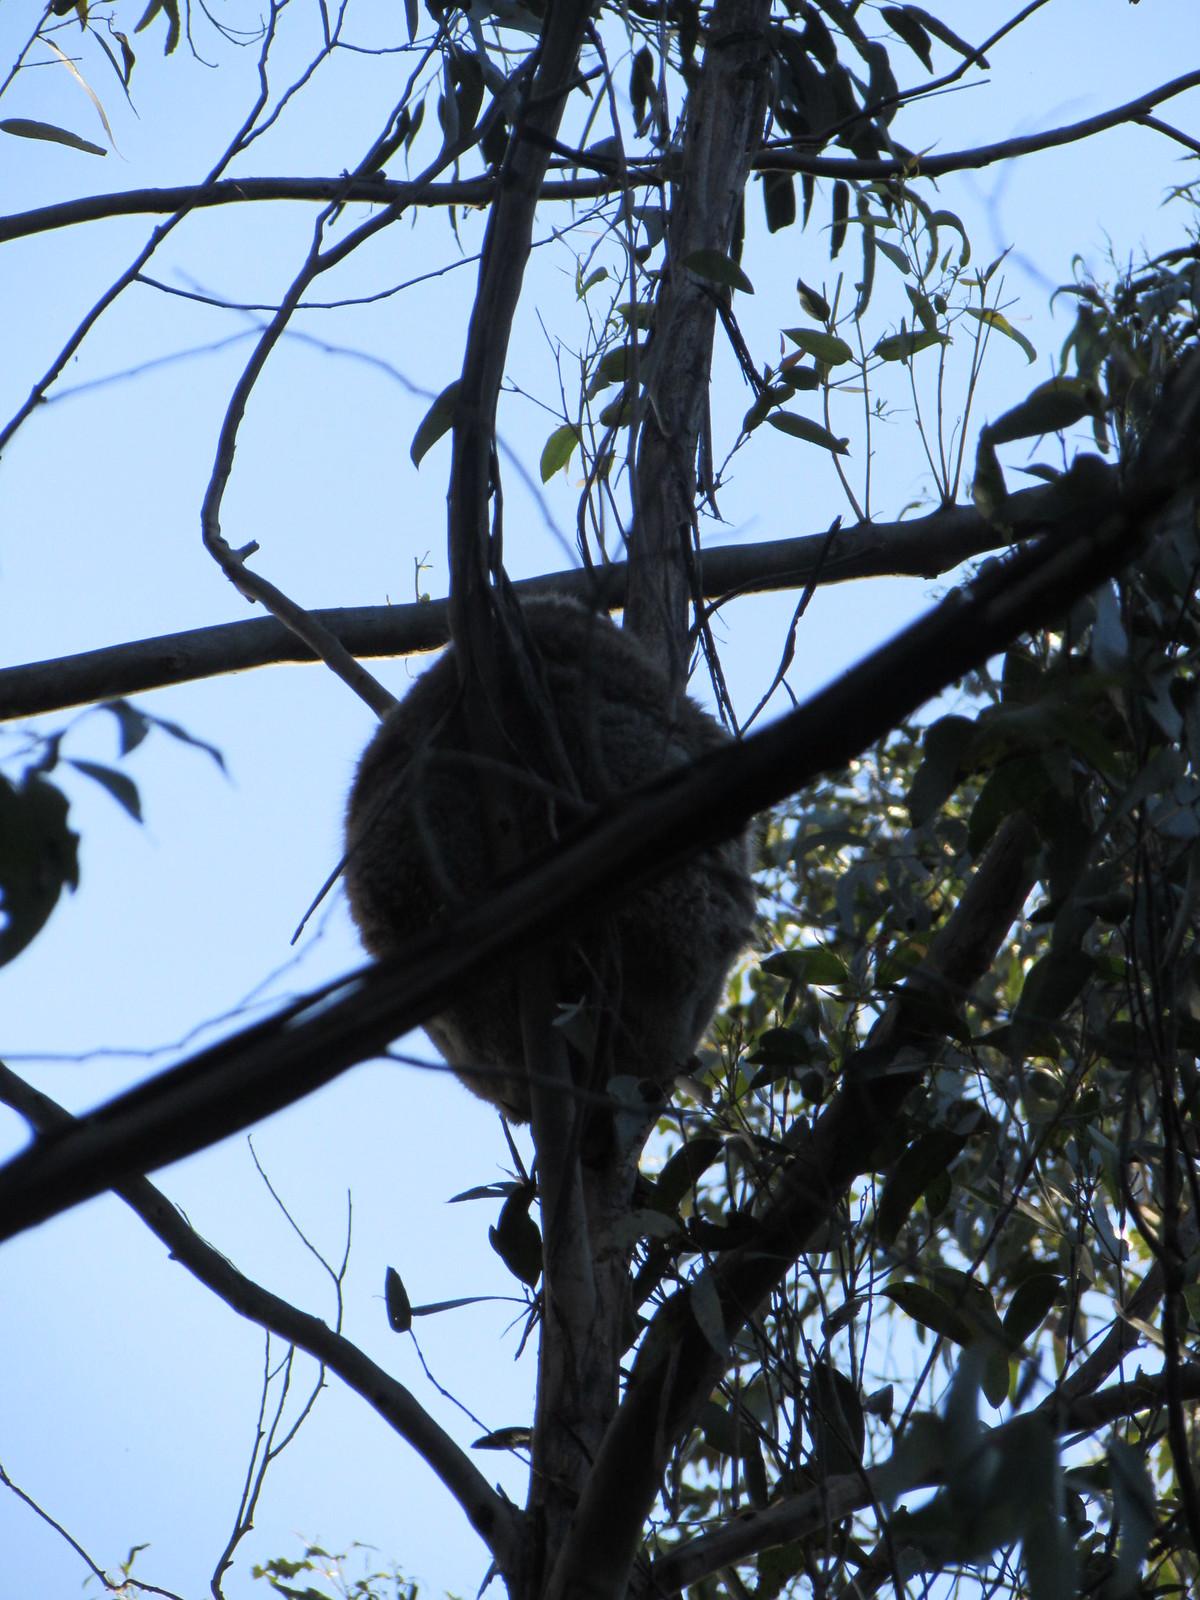 Koala #3, also fast asleep